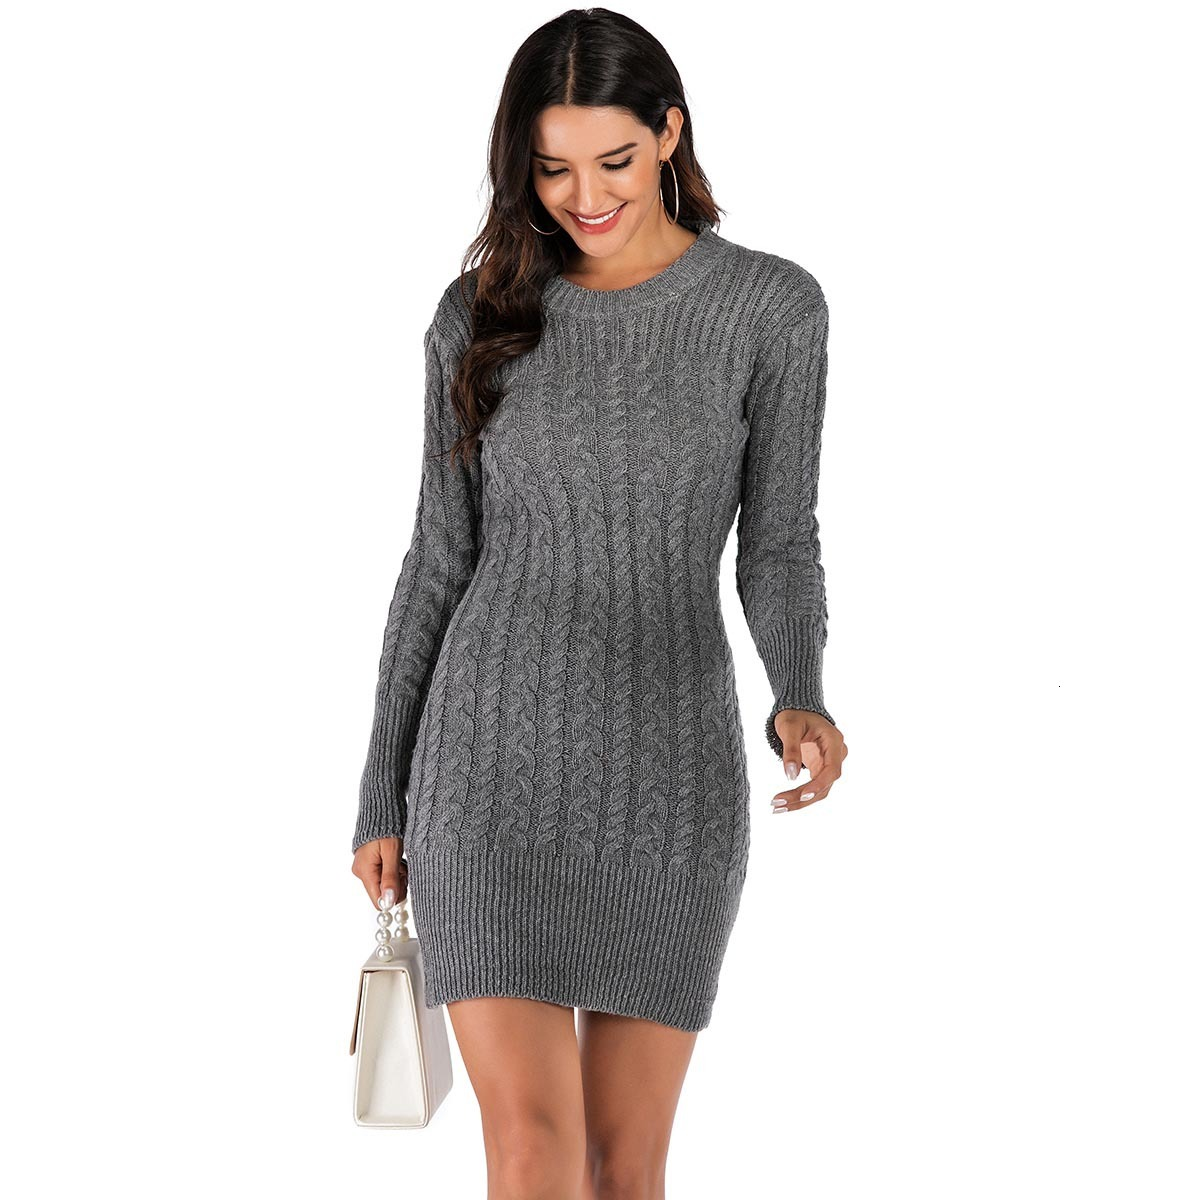 Casual Knitted Sweater Dress Long Sleeve O-Neck Bodycon Short Autumn Winter Dress Women Sexy Grey Pencil Dress Robe Femme 2020